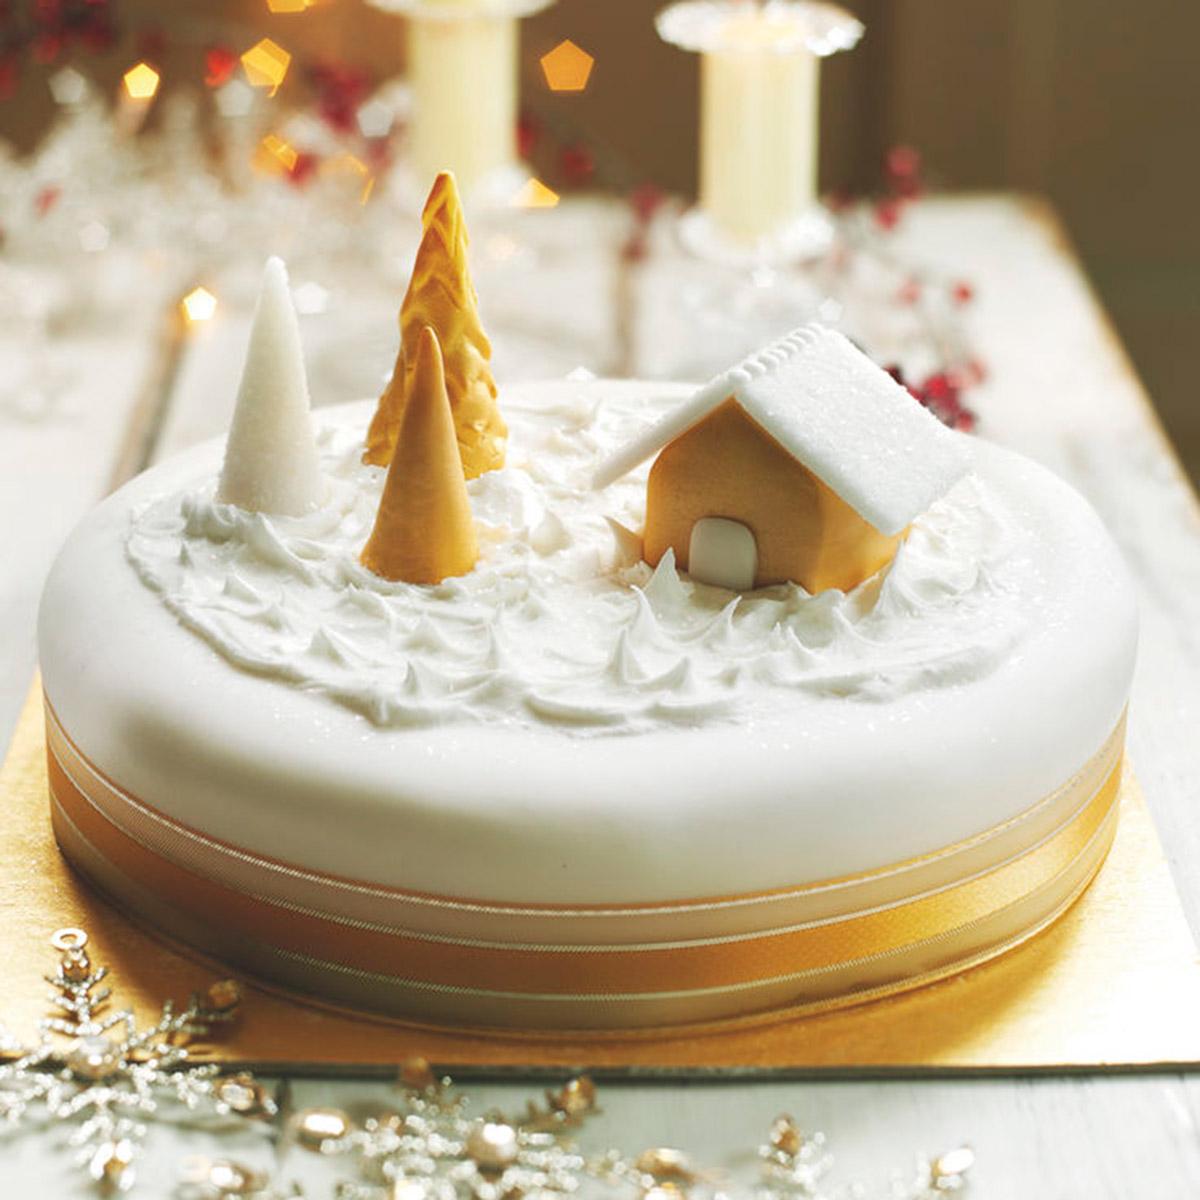 Christmas Cake Decorating Good Housekeeping : Tried and Tested Christmas Cakes 2014 - Best Christmas ...